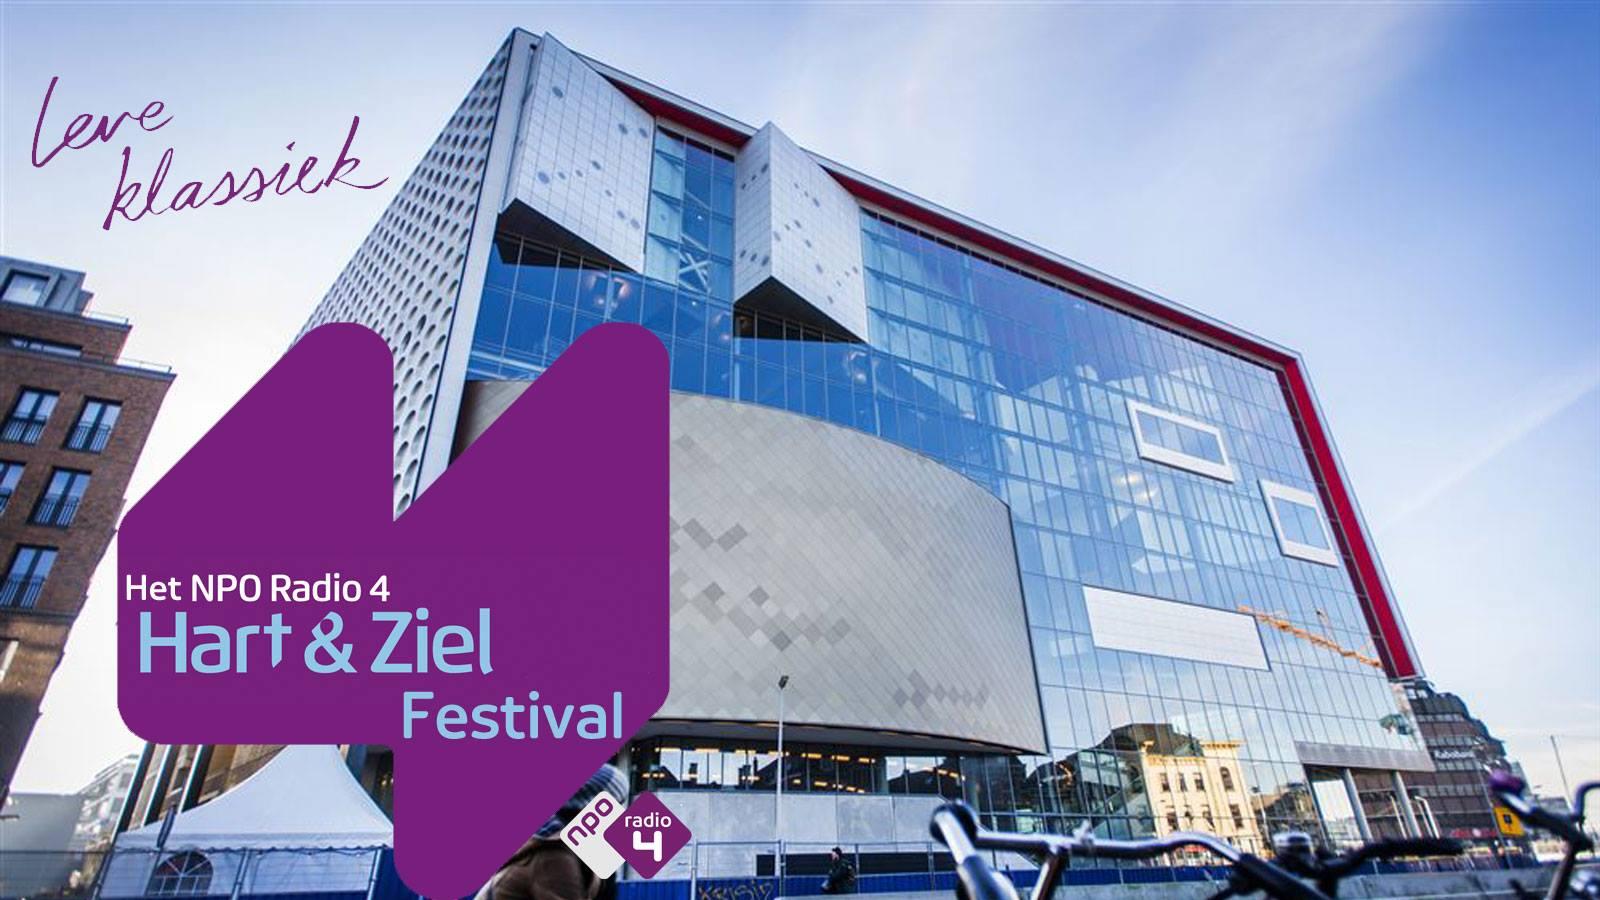 Hart & Ziel Festival